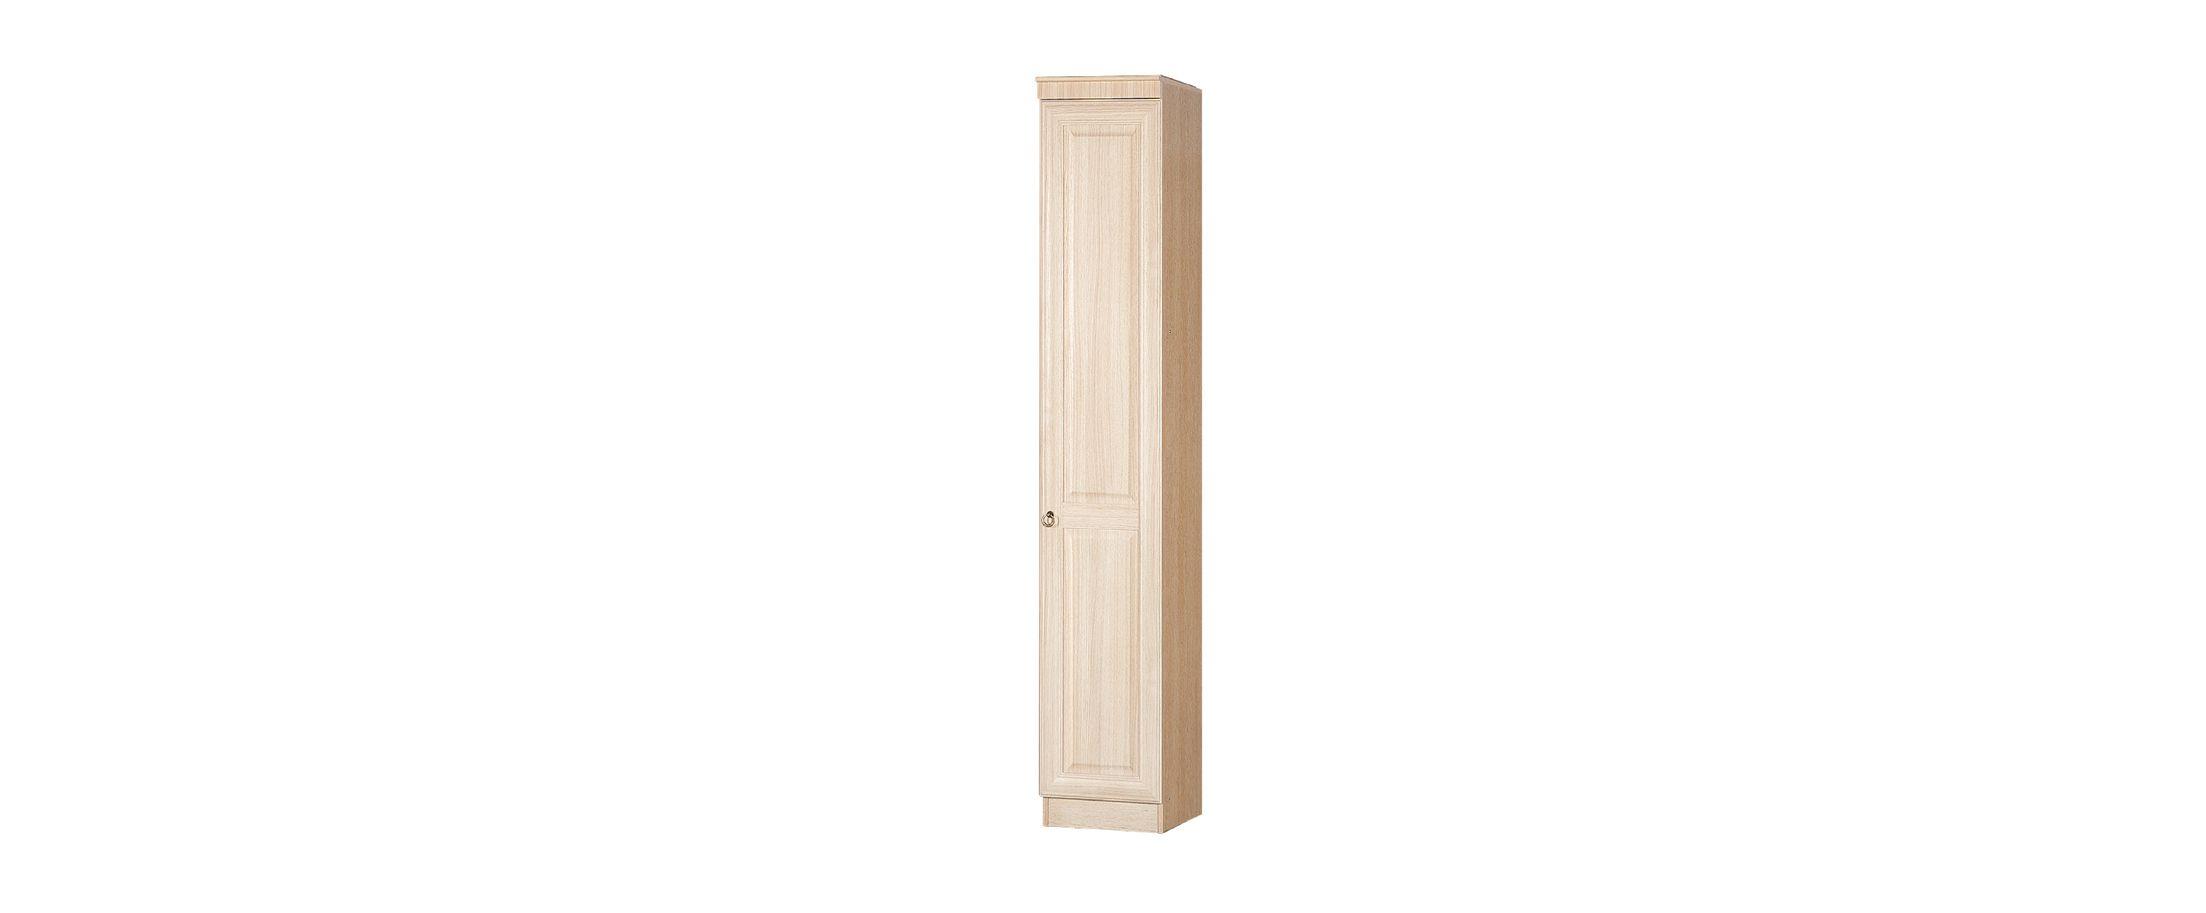 Шкаф для одежды Инна П 616Шкаф для одежды Инна П 616 Модель 900. Артикул Д000495.<br>